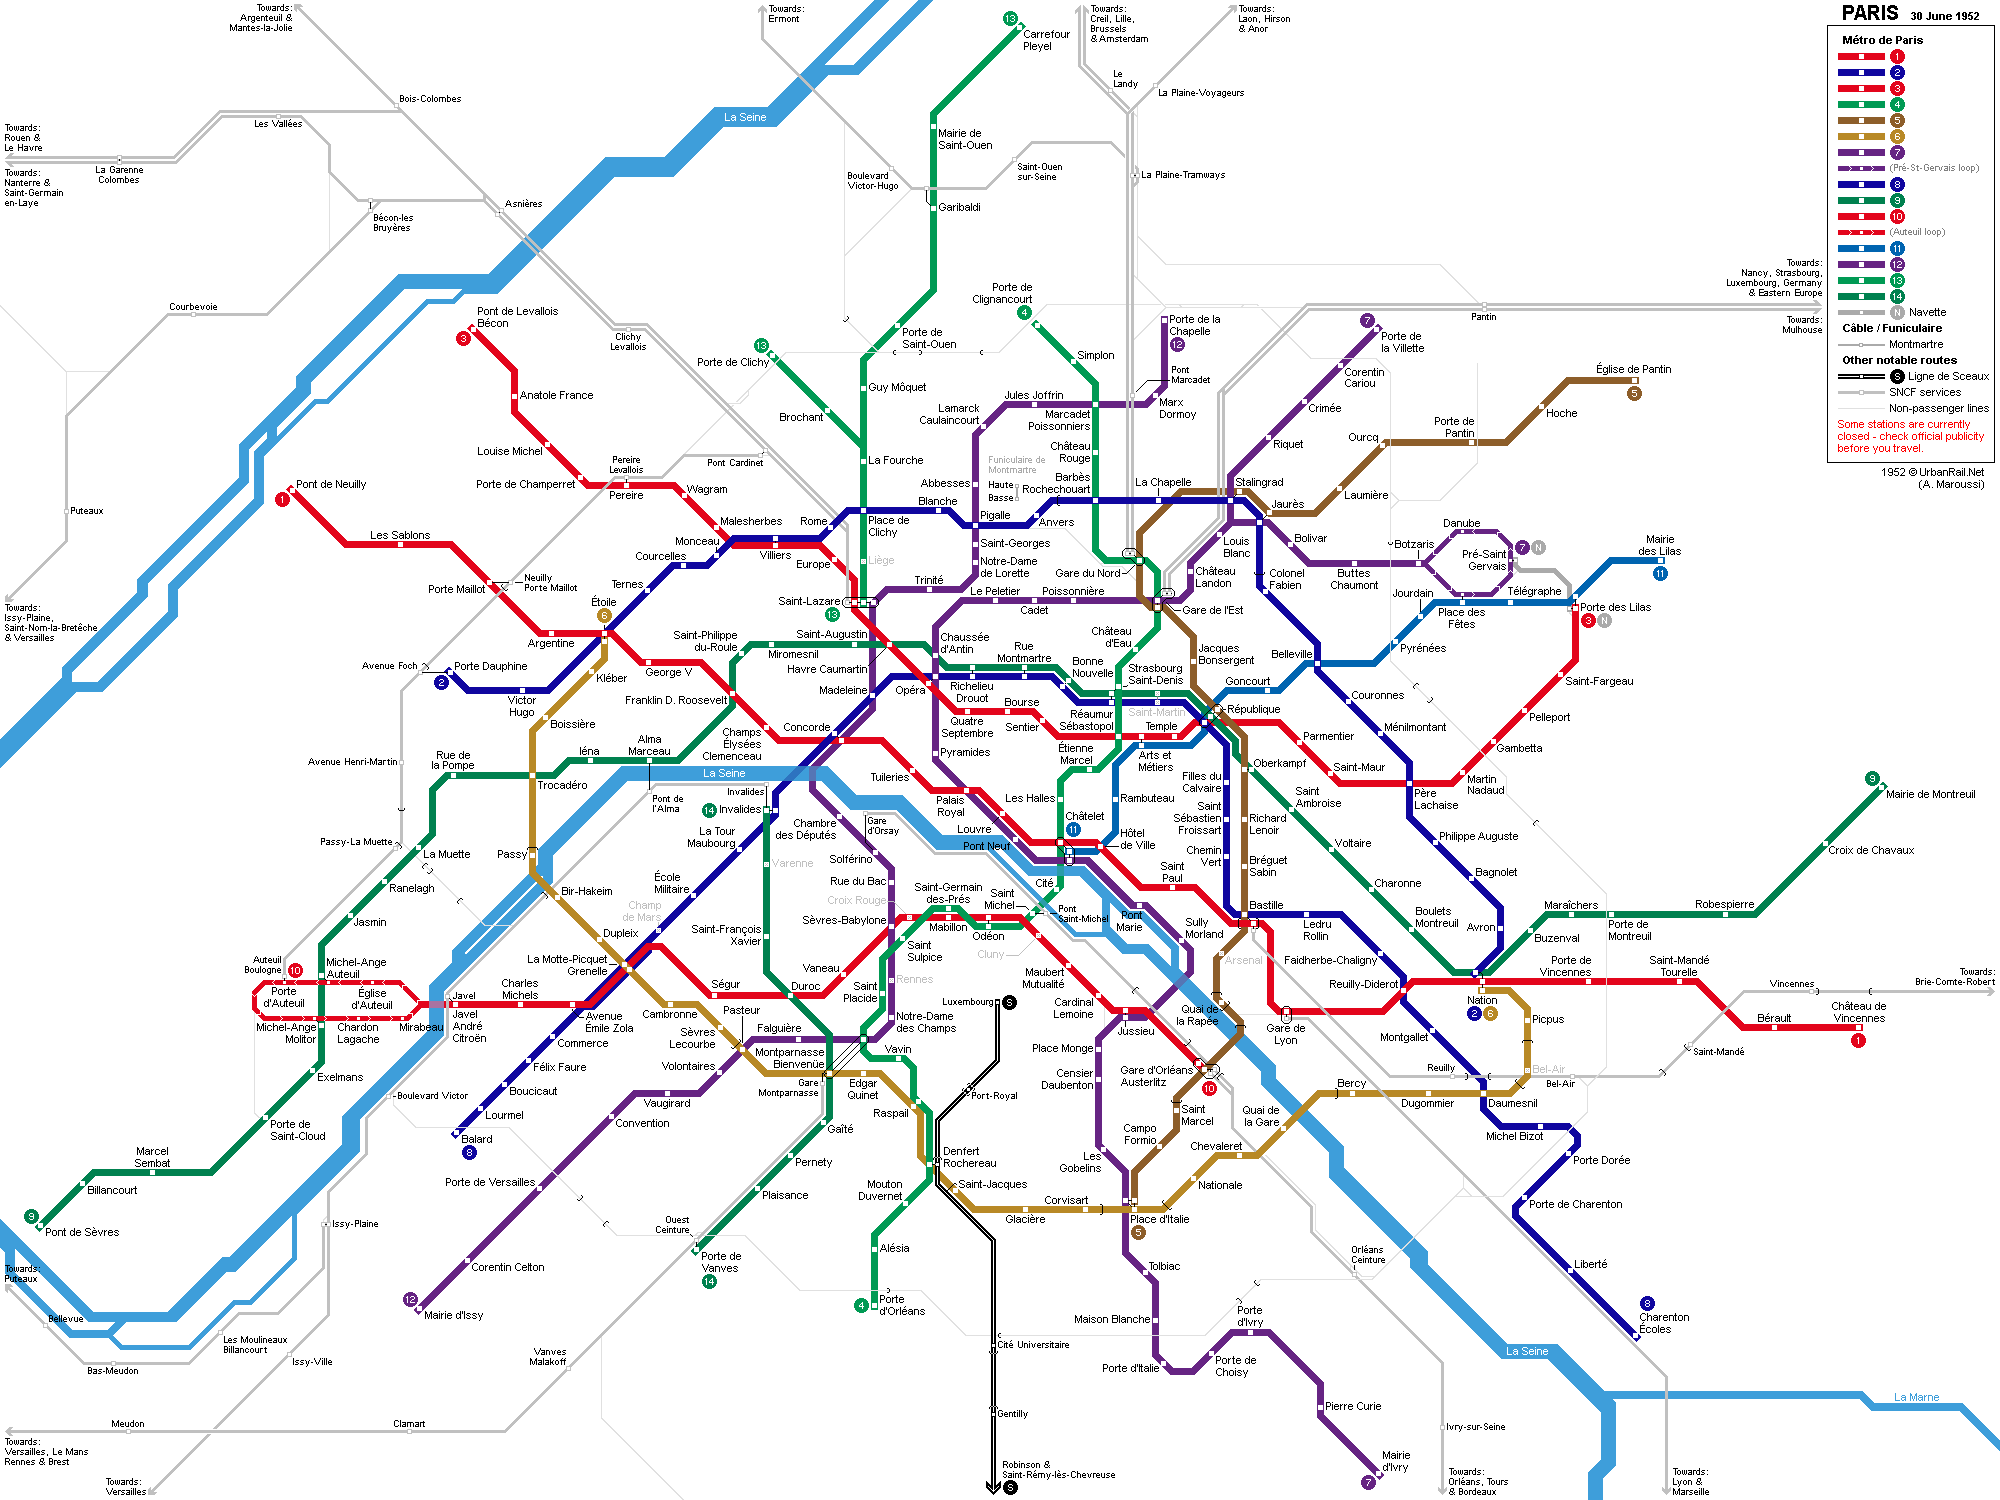 Mapa Do Metro De Paris.Urbanrail Net Europe France Metro De Paris Paris Subway